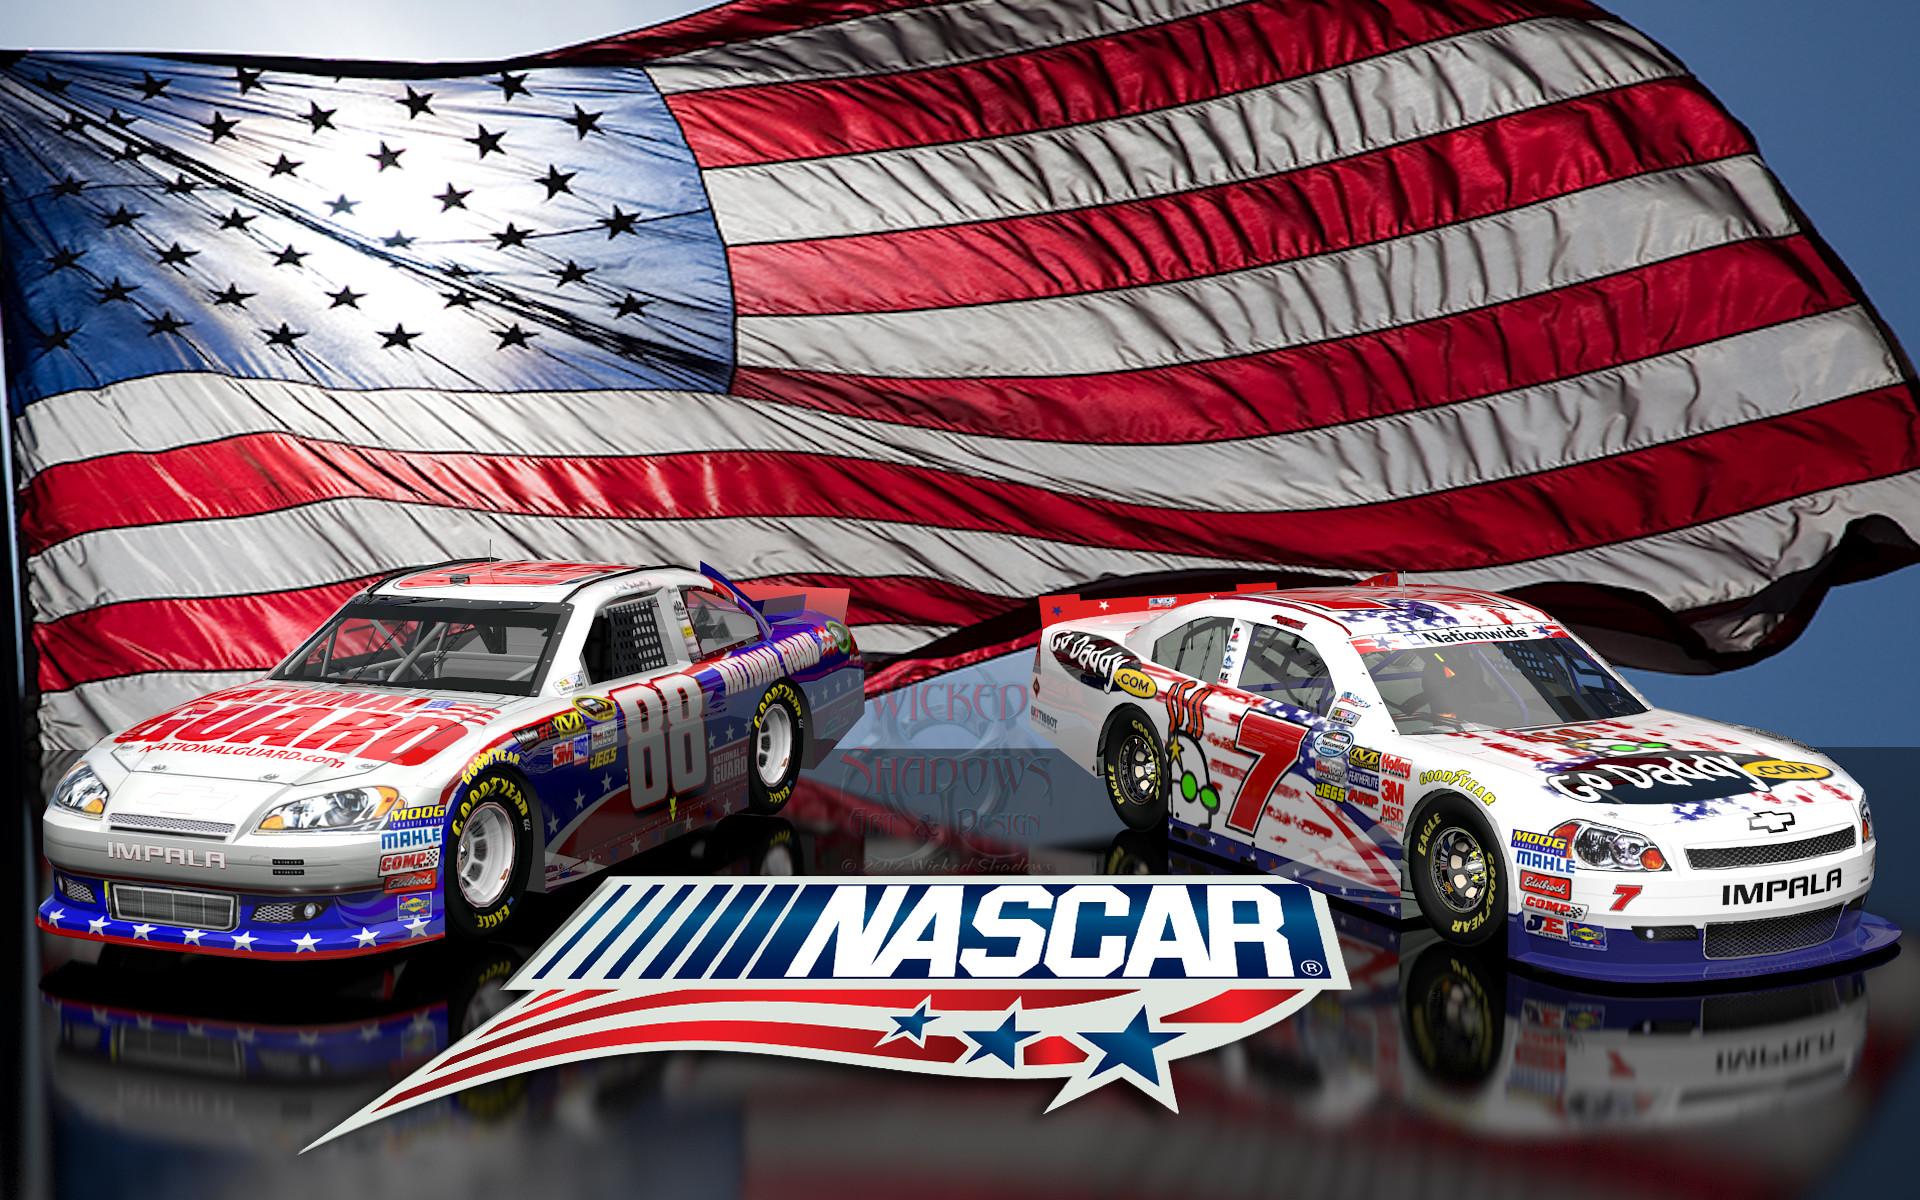 Danica Patrick Dale Earnhardt Jr NASCAR Unites wallpaper 16×10